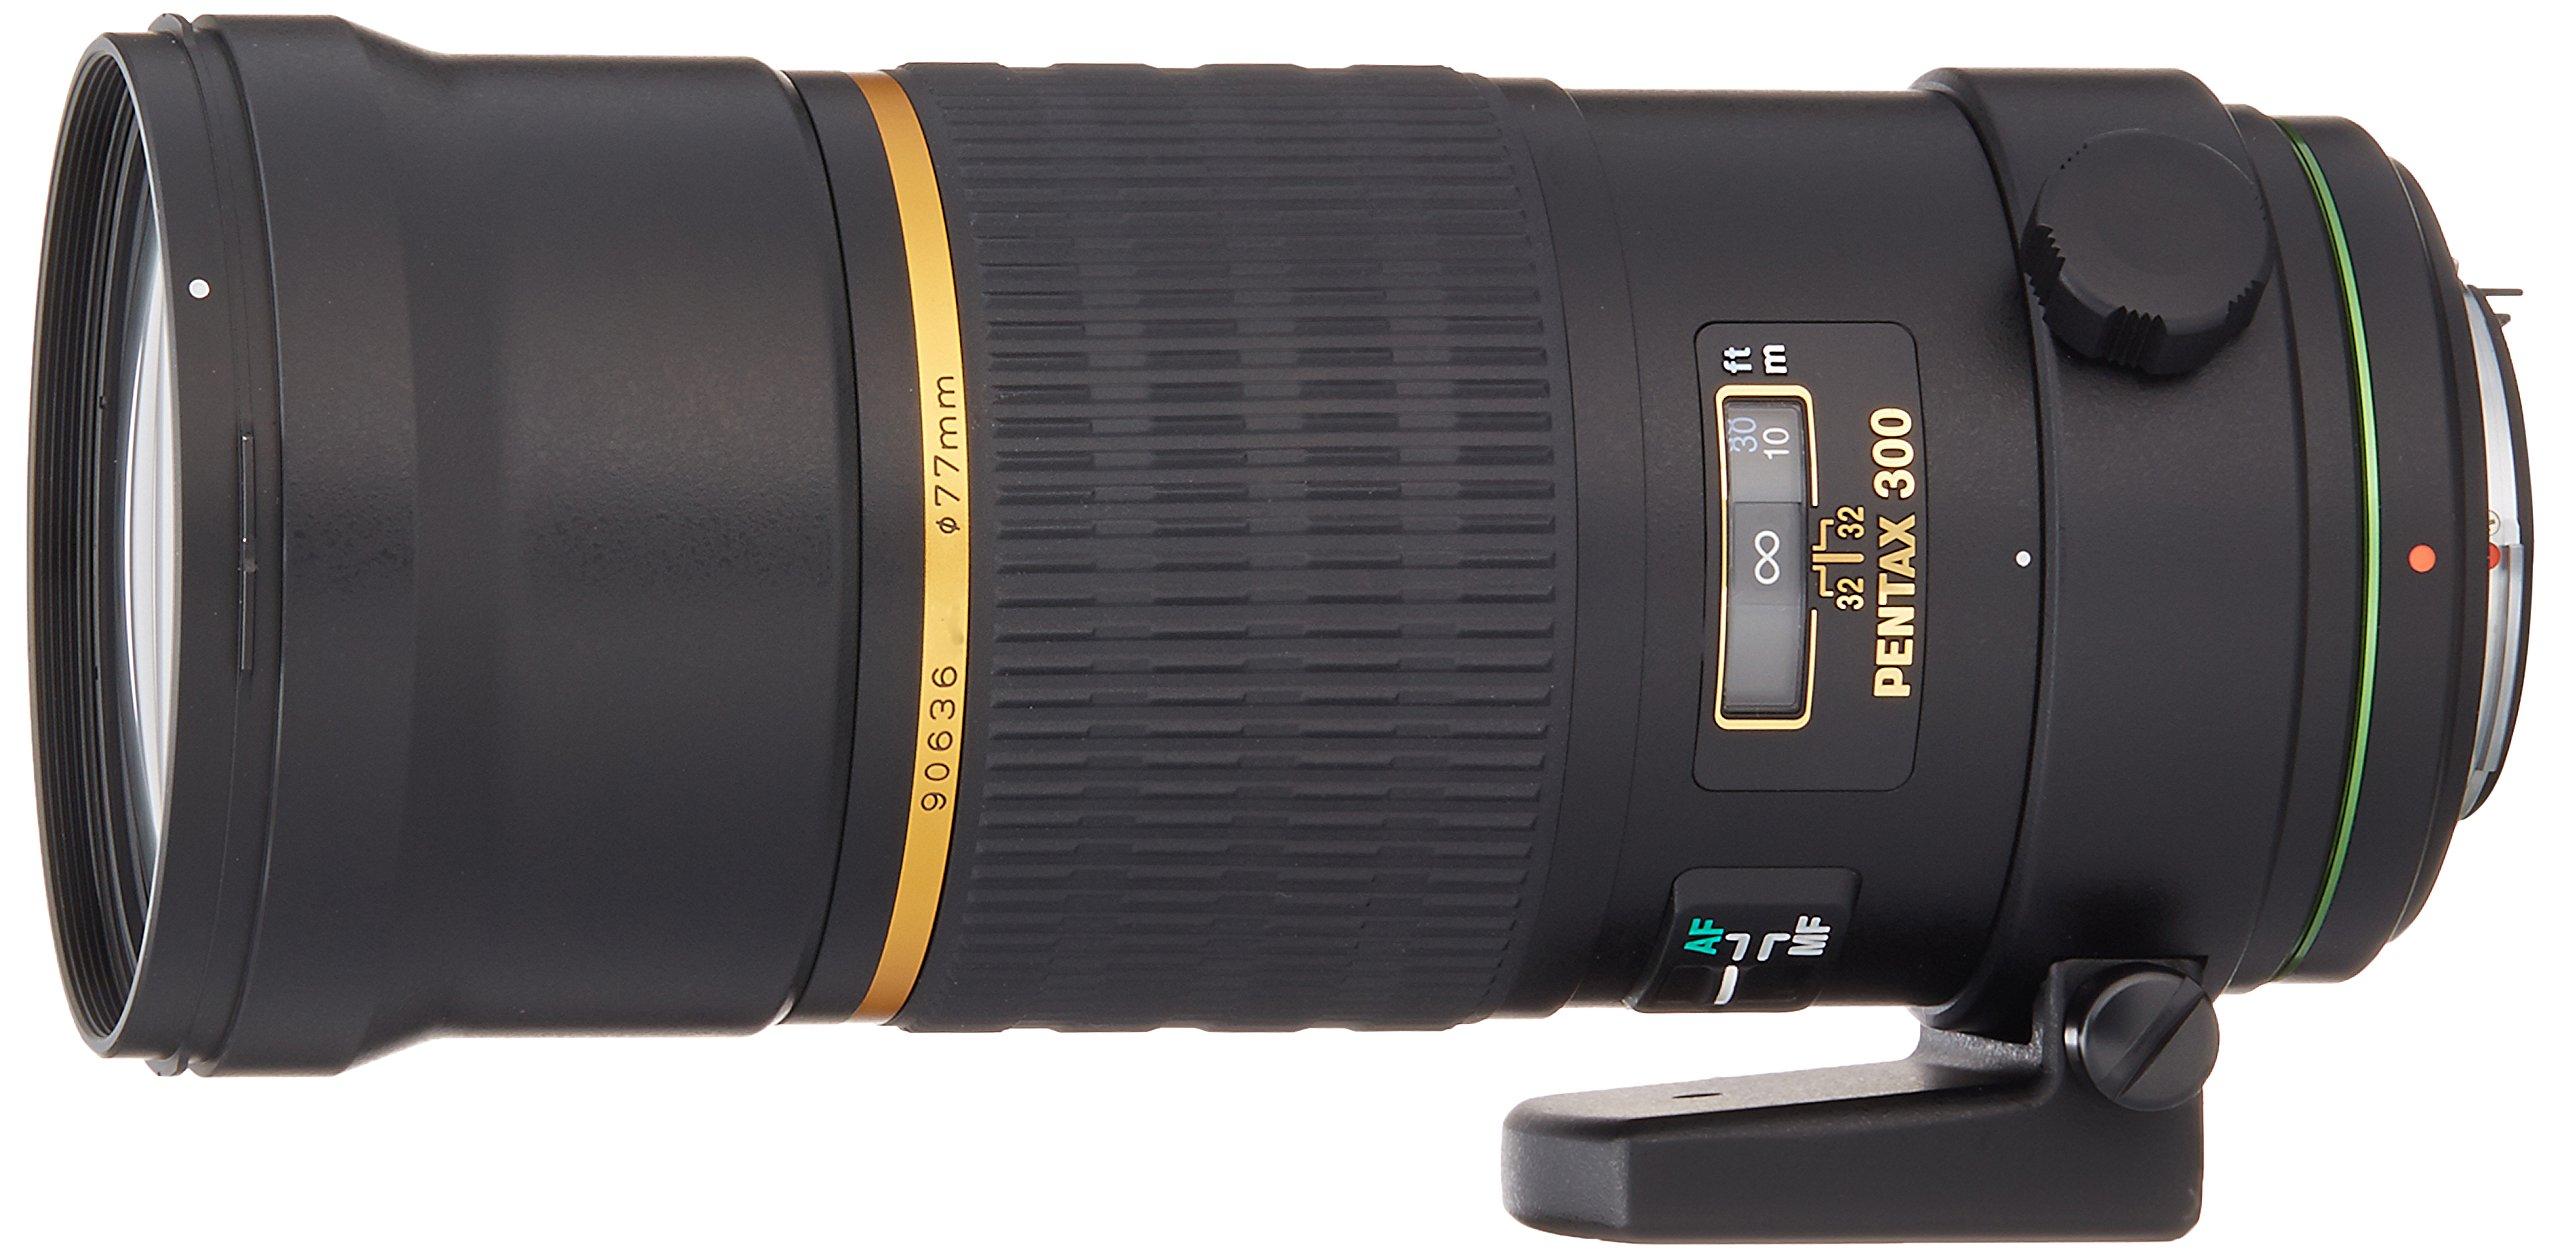 Pentax smc DA 300mm f/4.0 ED (IF) SDM Black - camera lenses (1.4 m, 5.4°, Metal, Black, 8.3 cm, 7.7